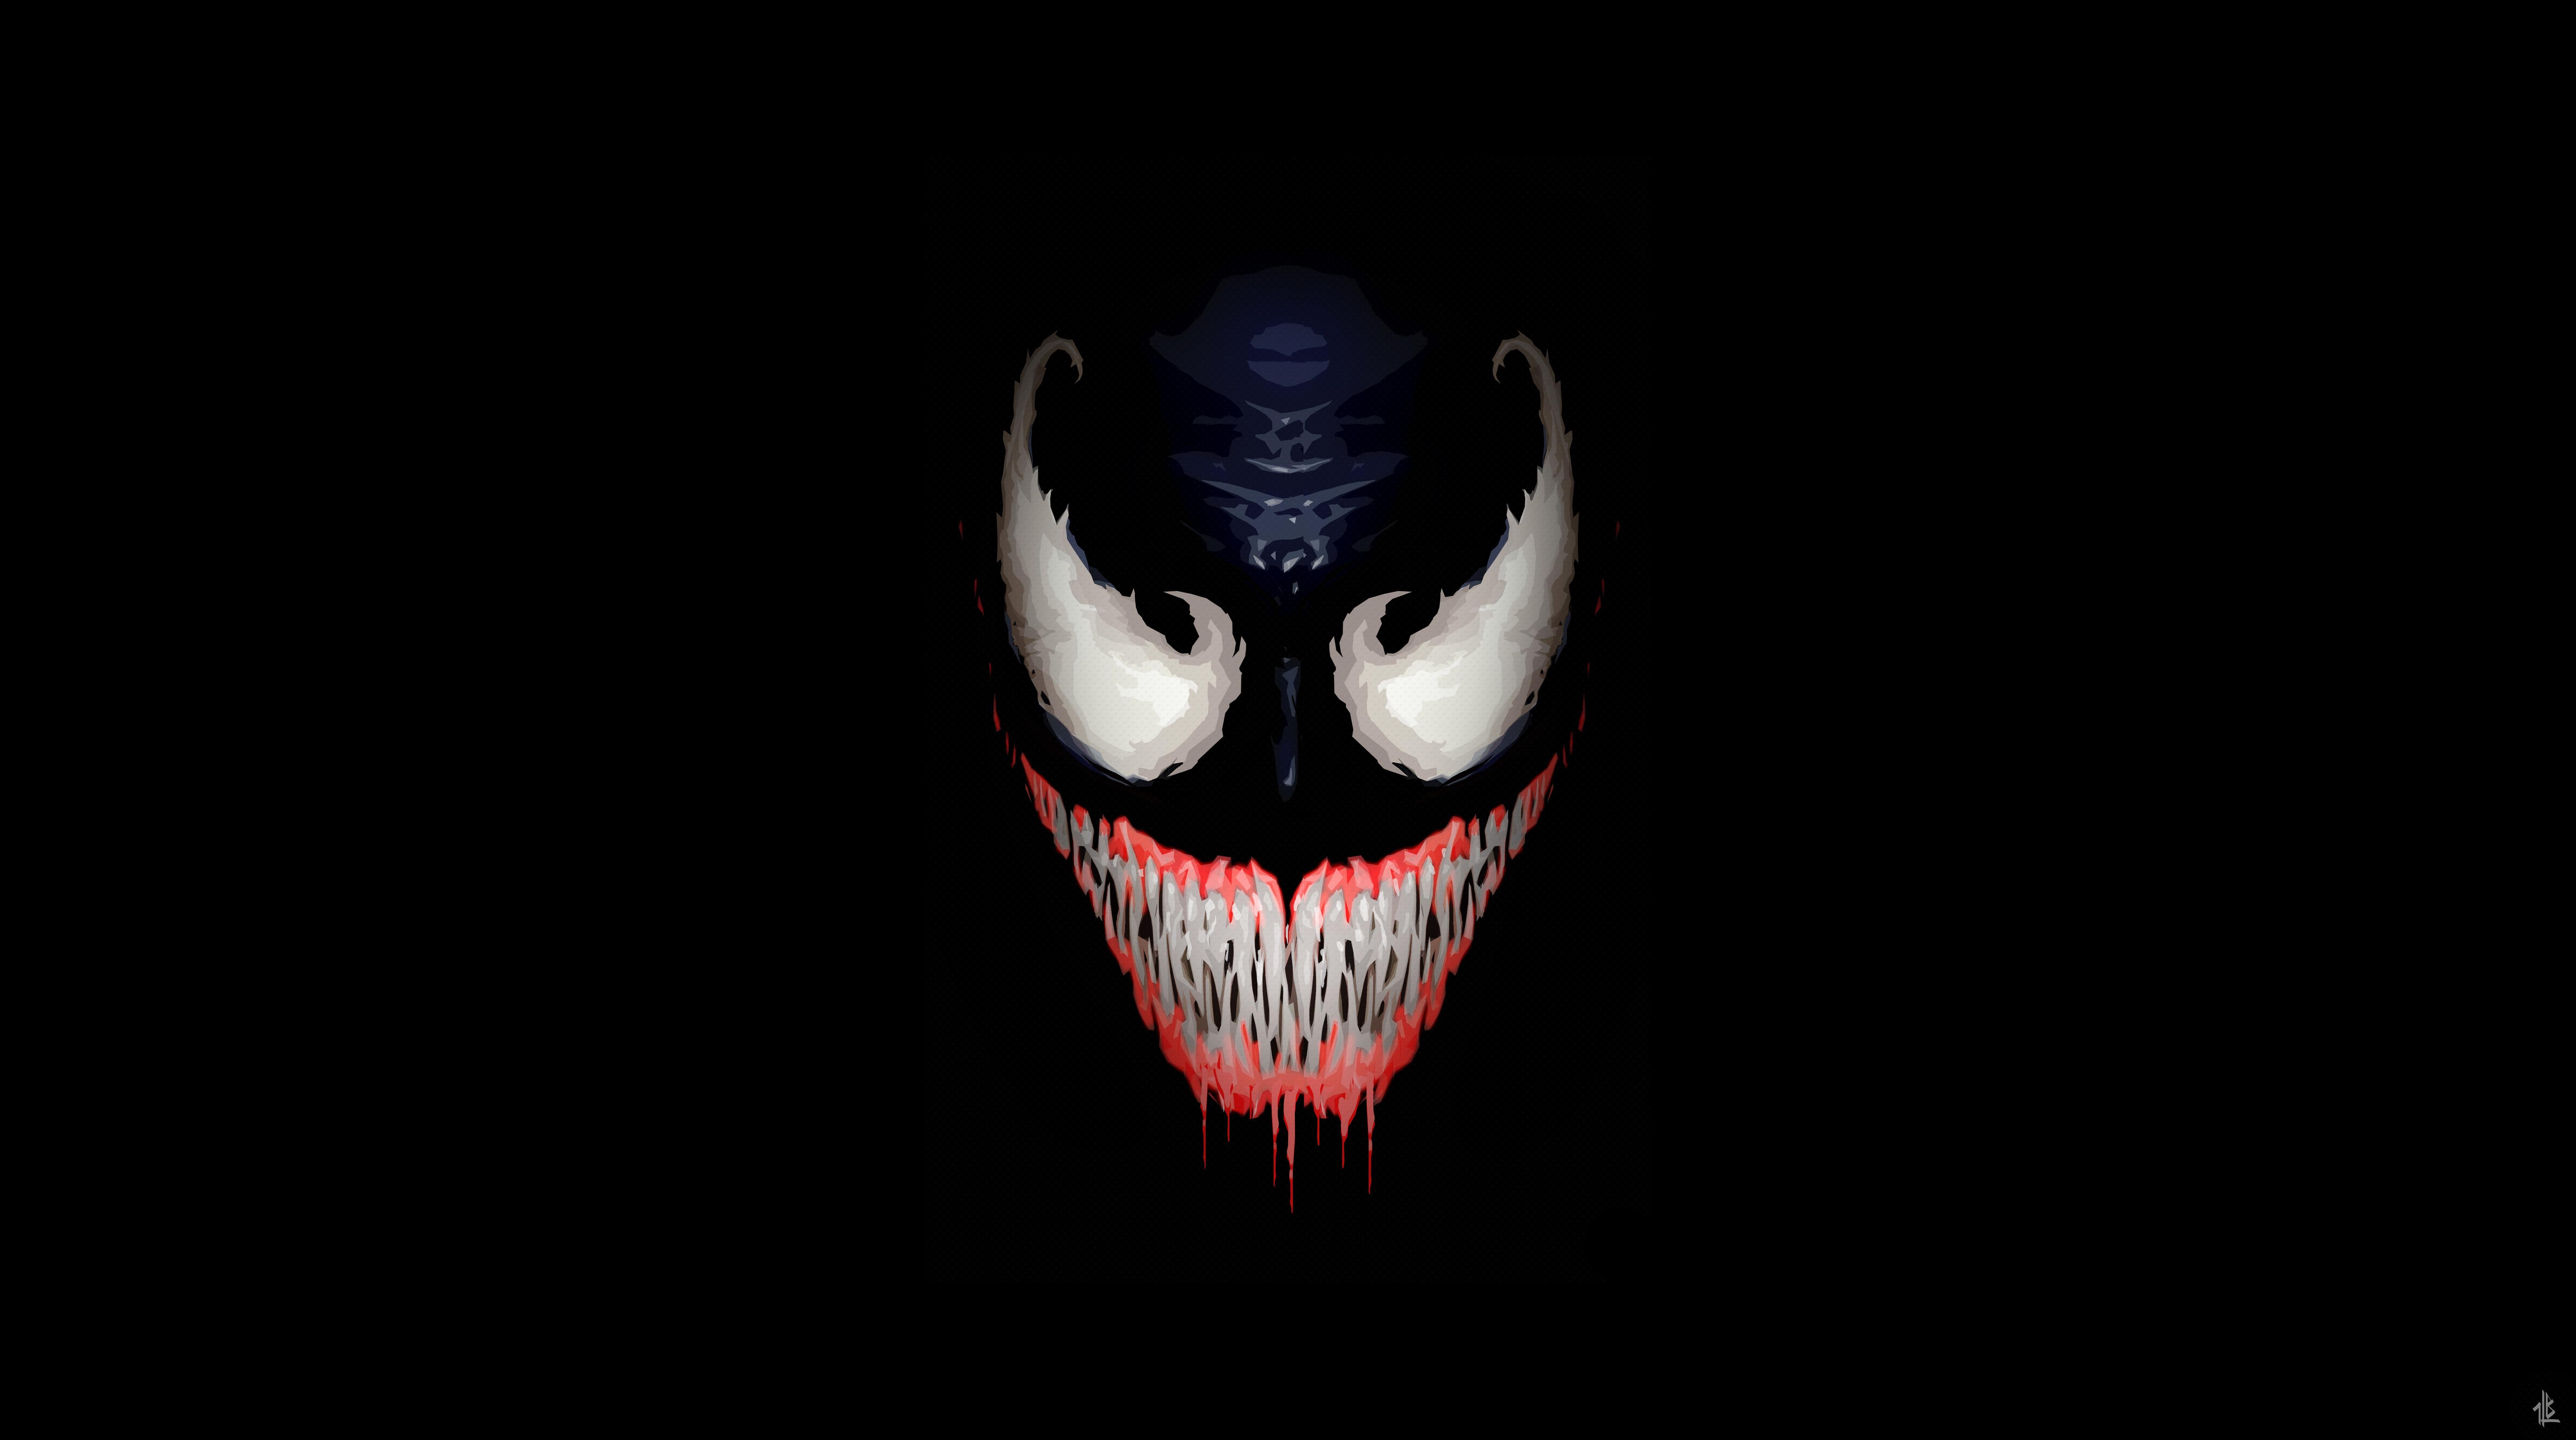 Venom Wallpapers Pictures Images: 2048x1152 We Are Venom Minimalism 5k 2048x1152 Resolution